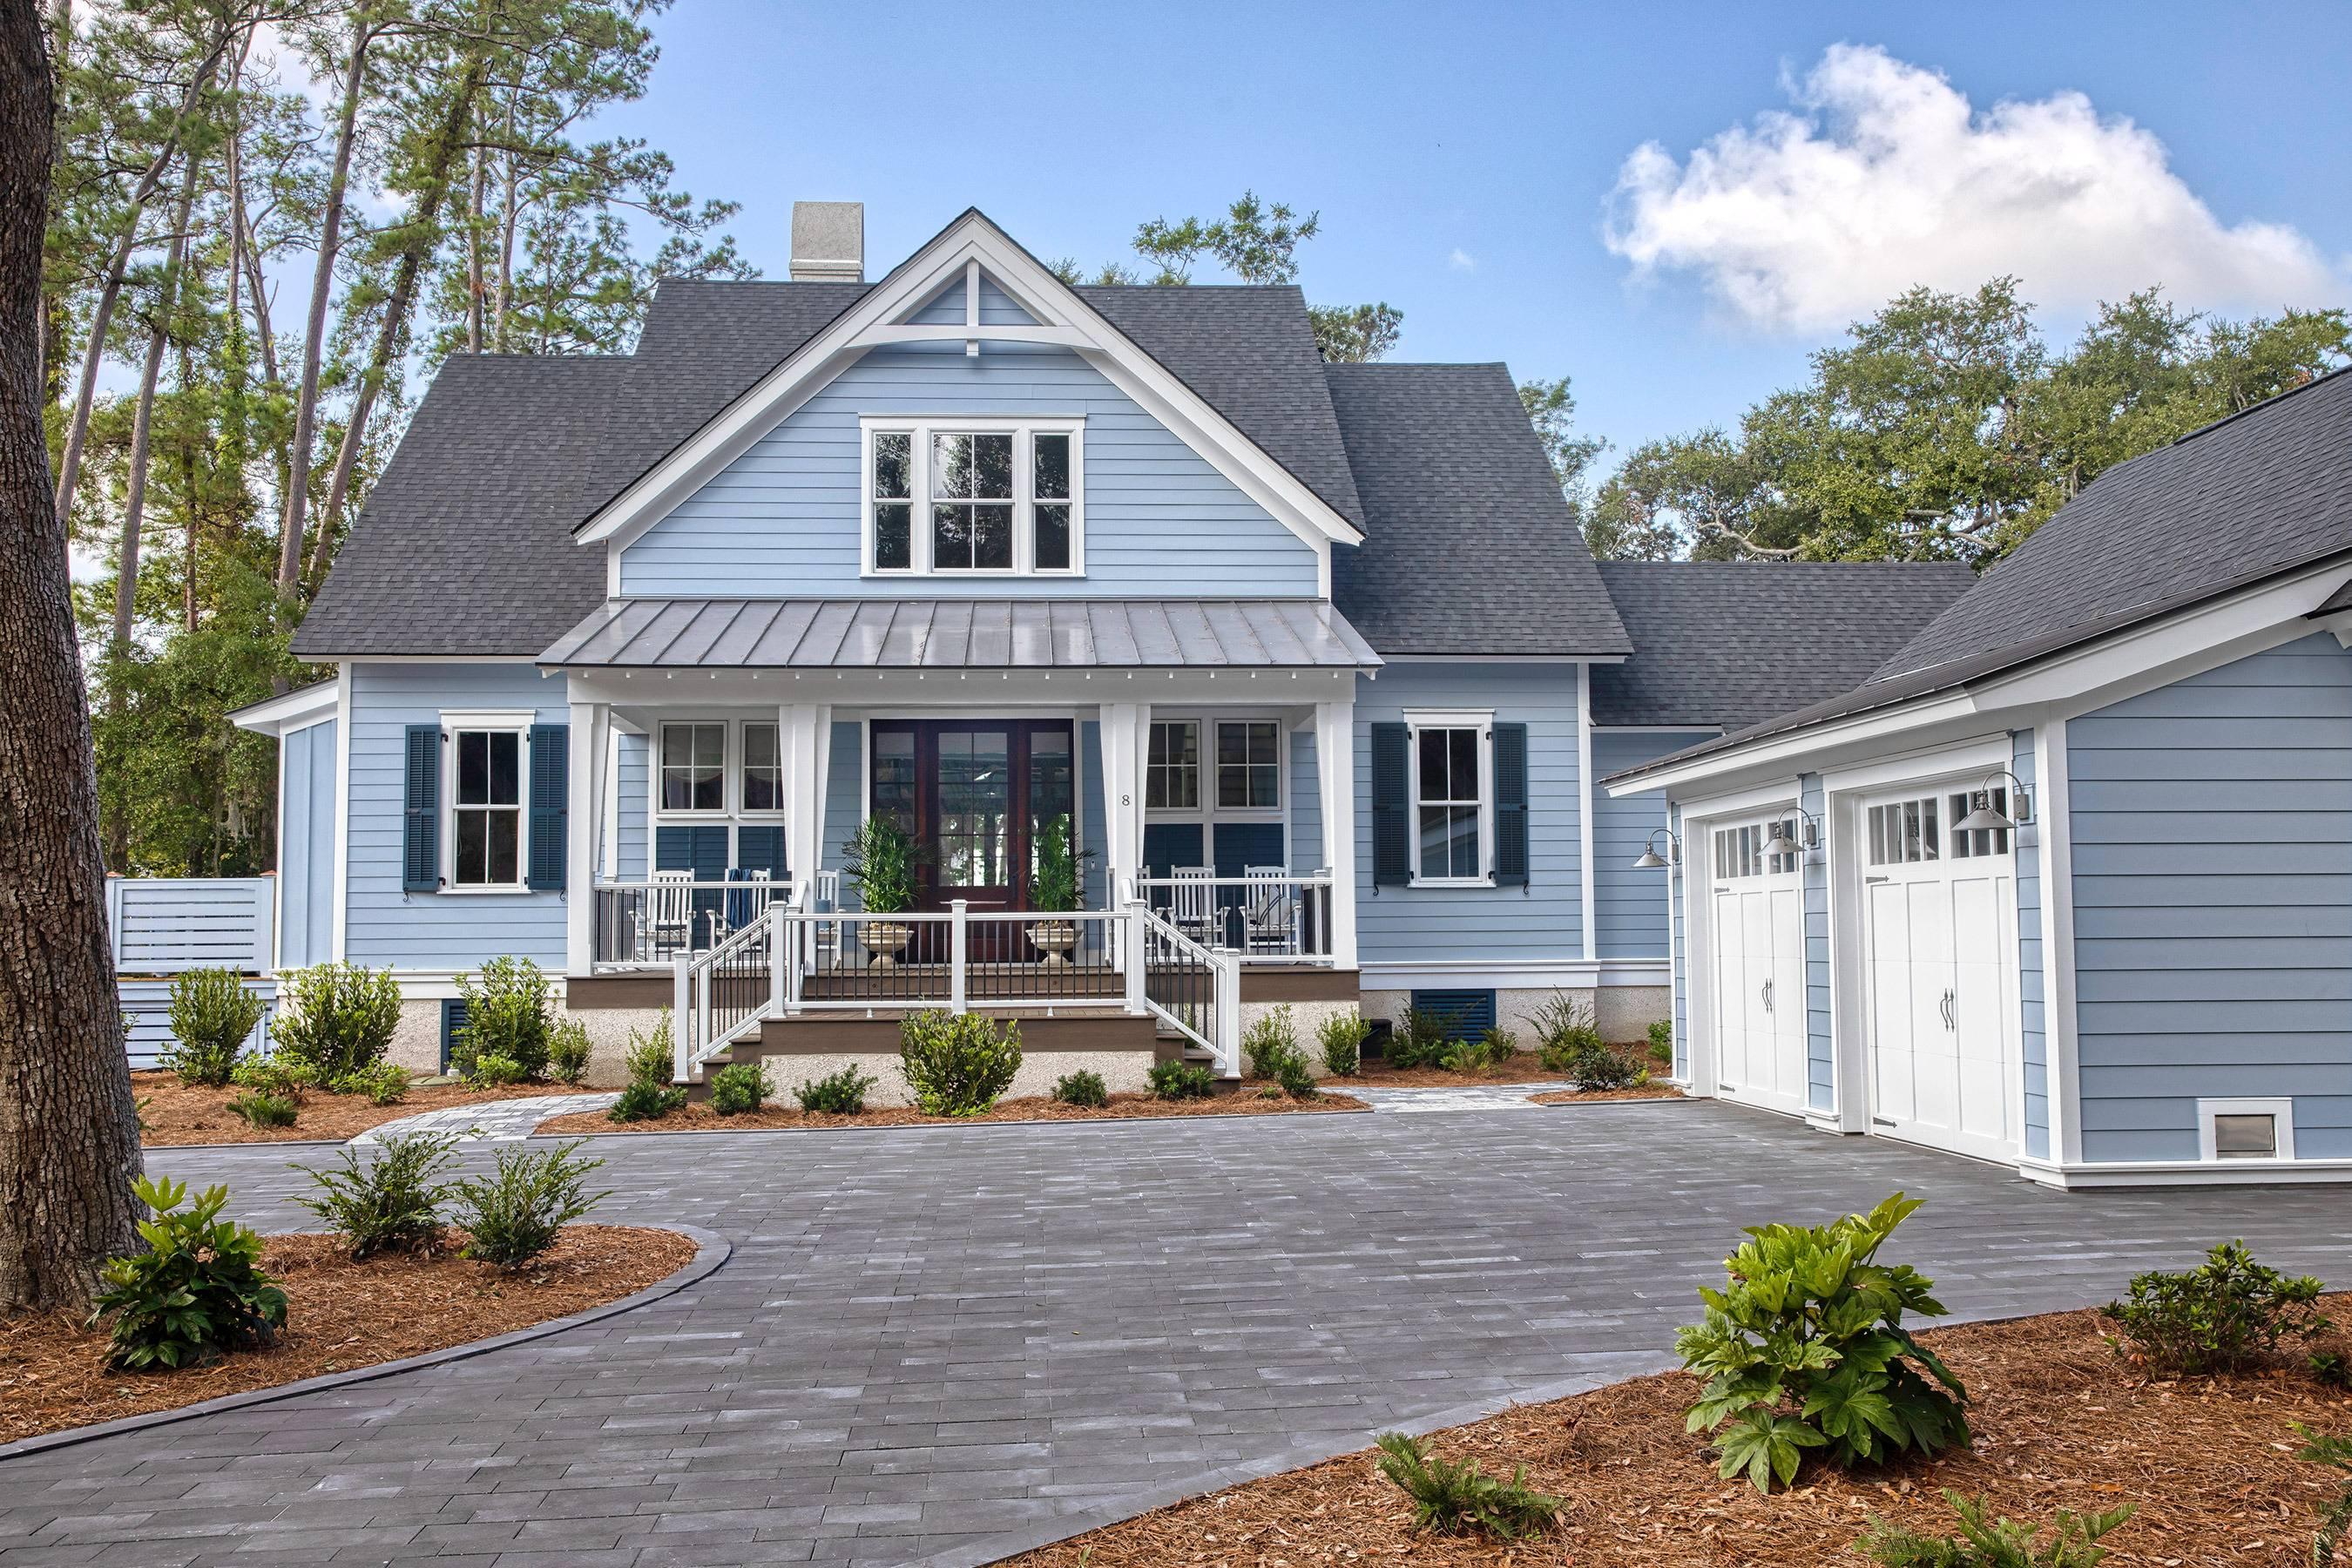 hgtv dream home 2020 front yard